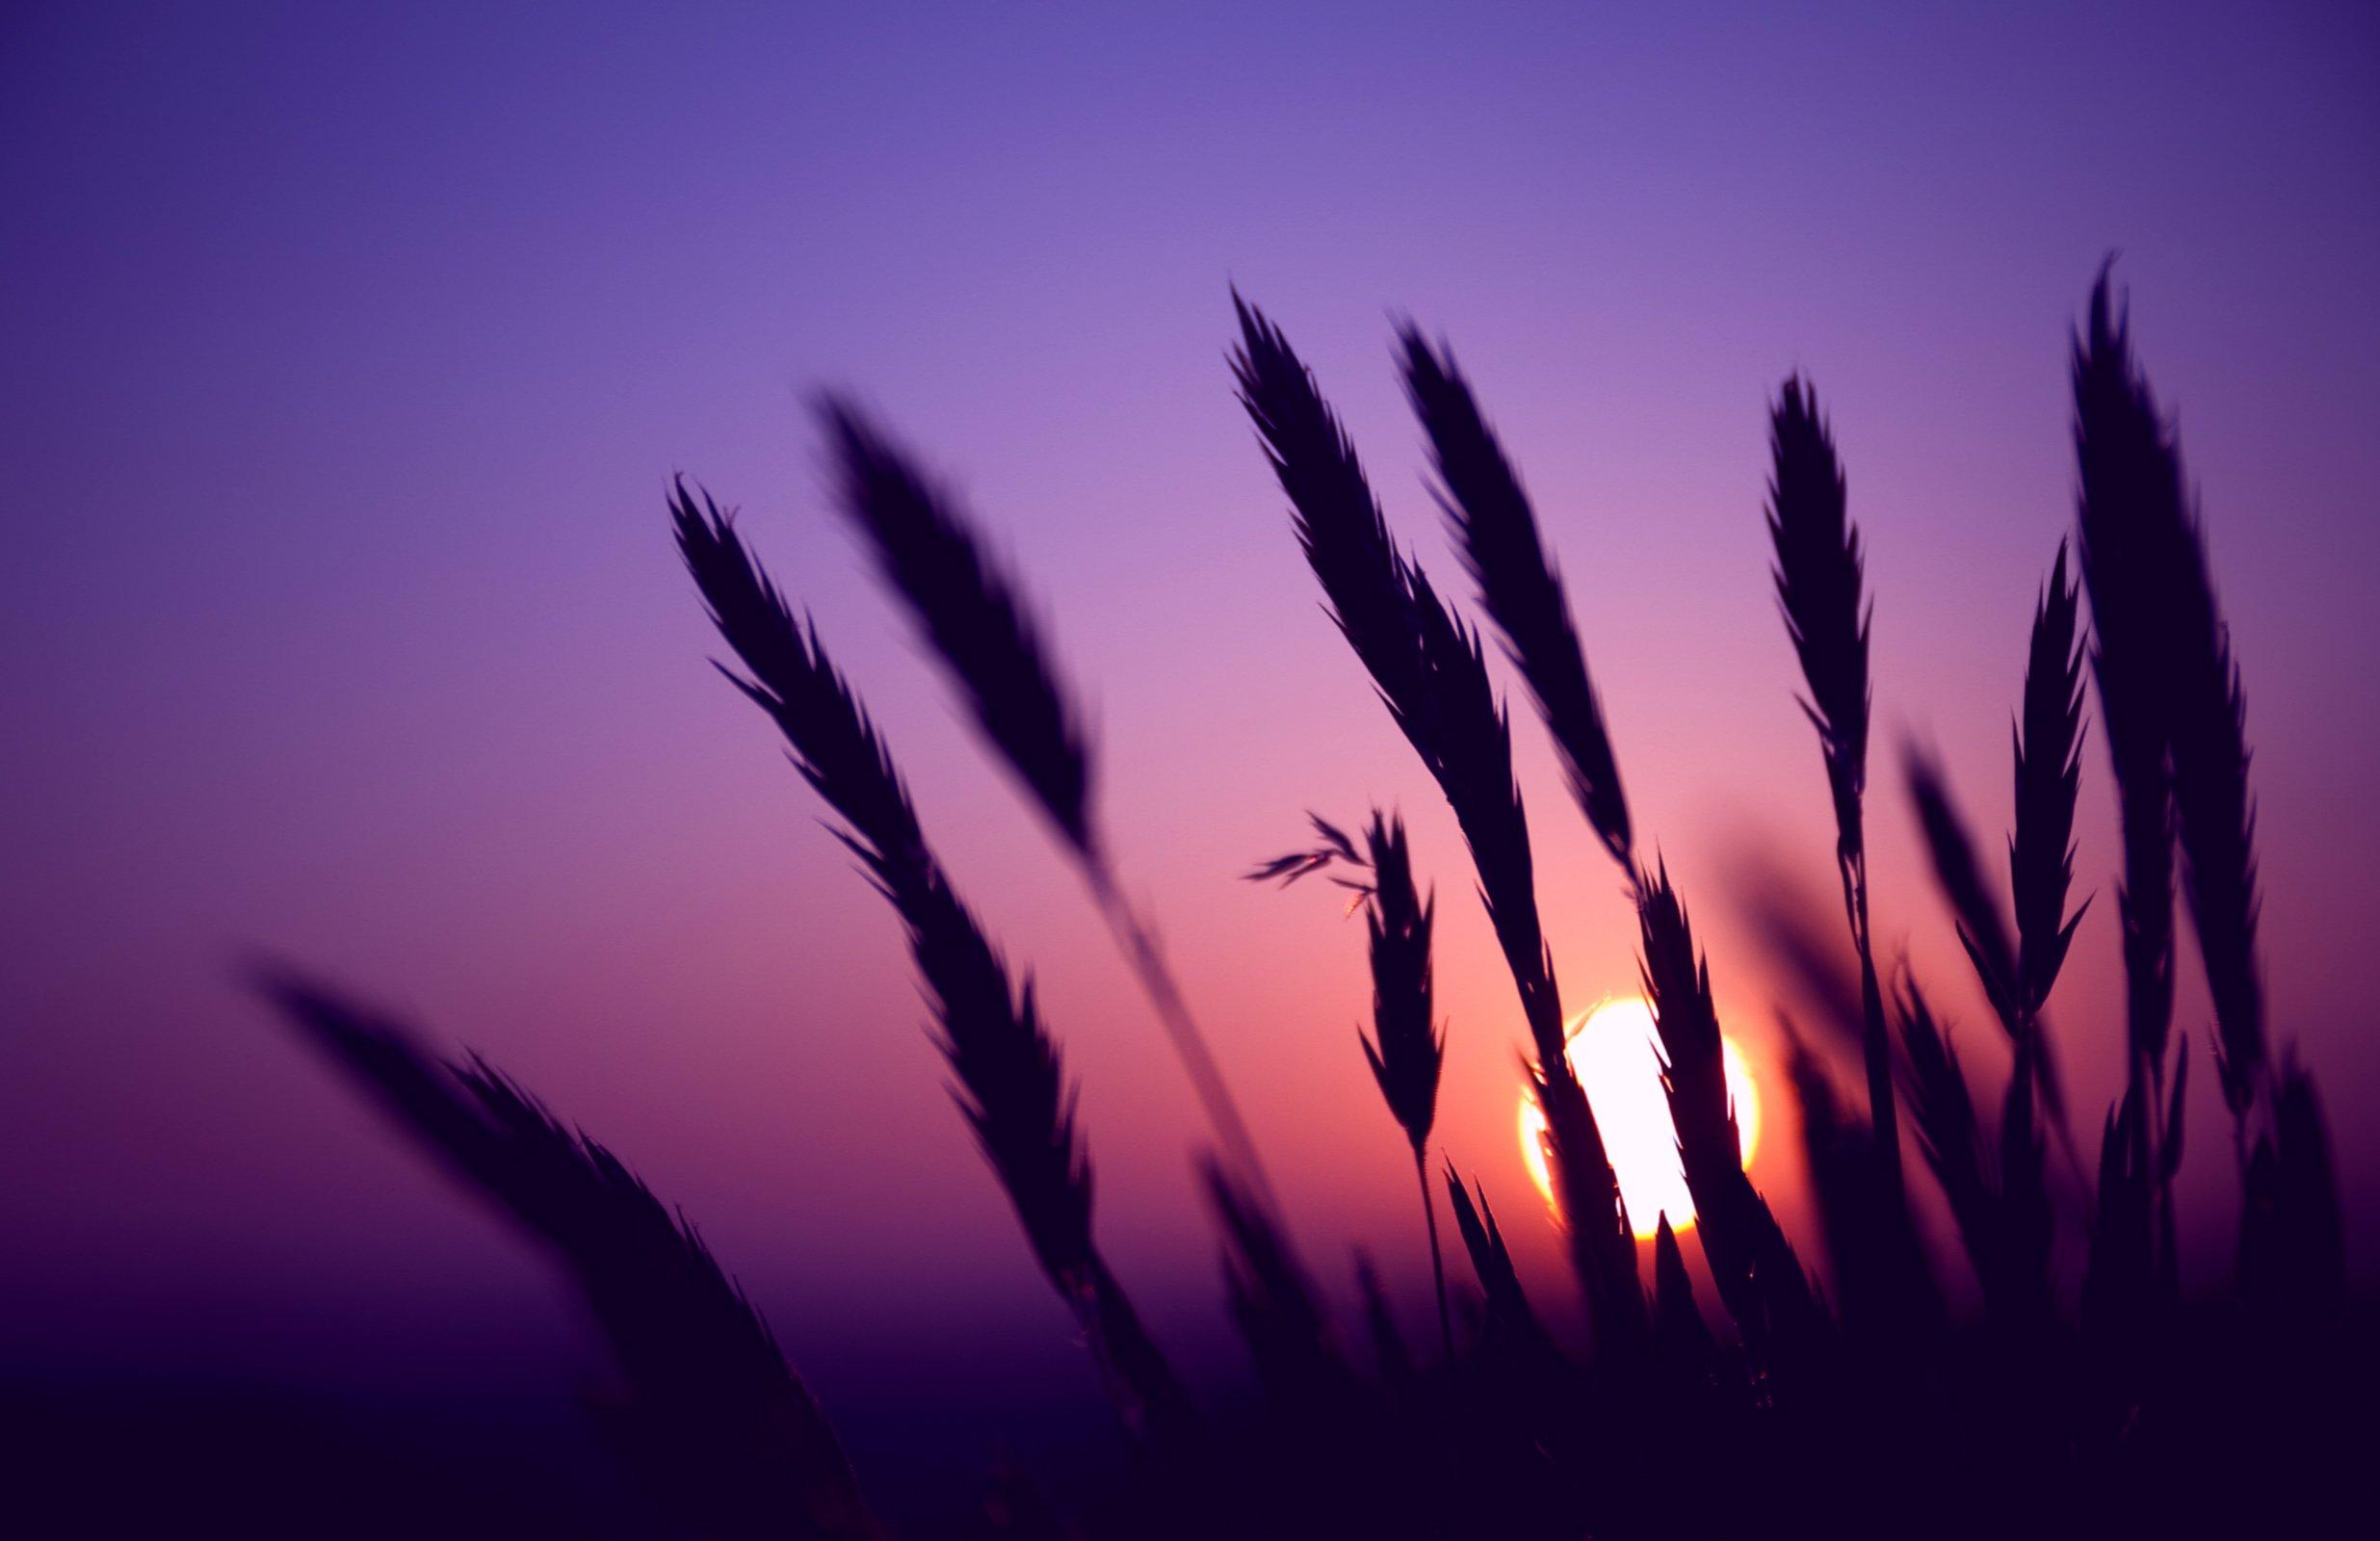 purple-sunset-wallpapers-hd